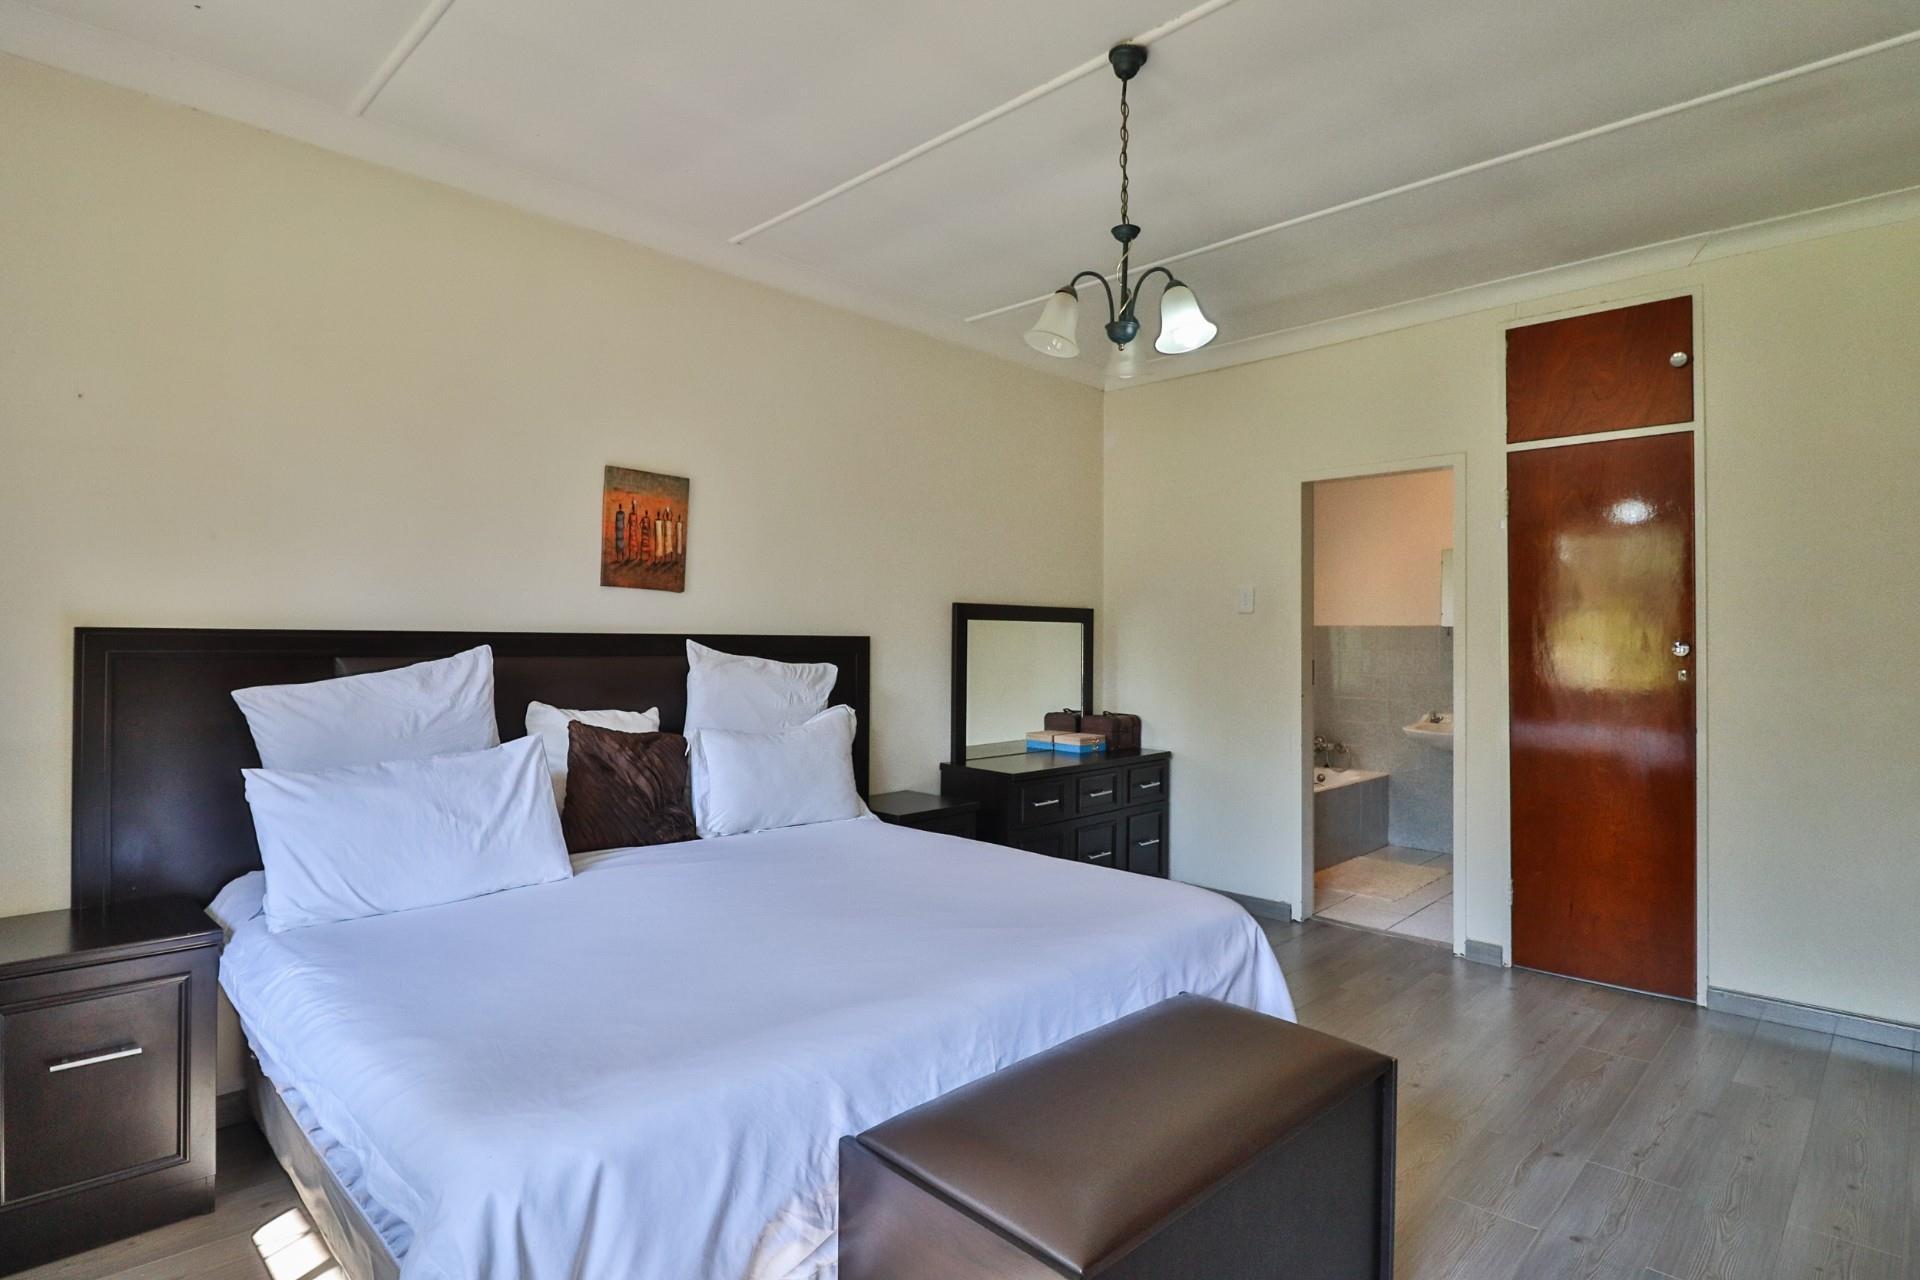 3 Bedroom House For Sale in Malanshof